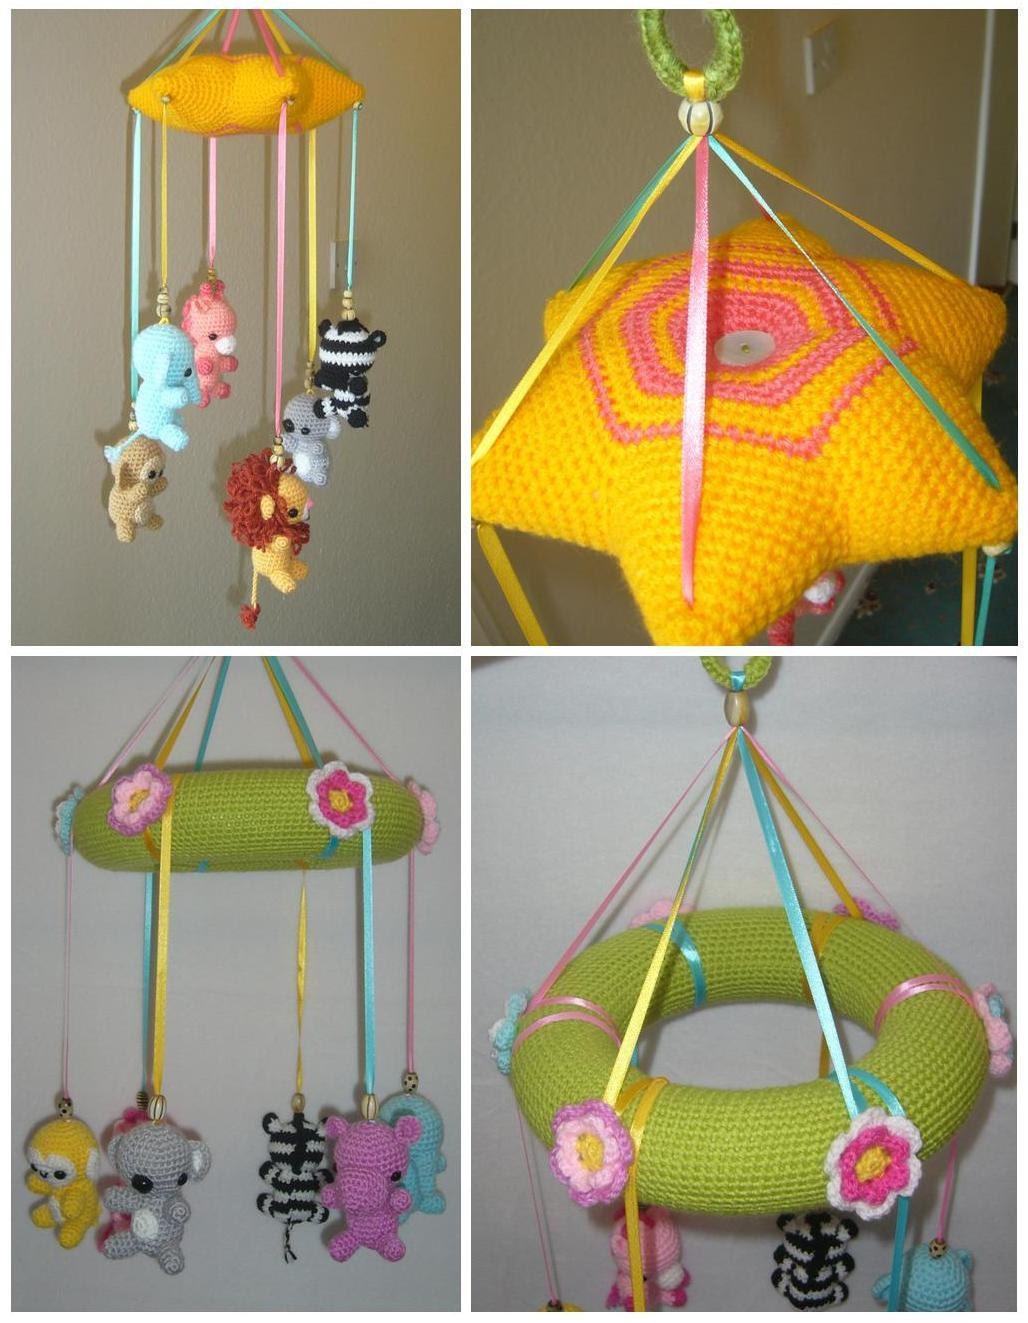 Crochet Baby Mobile Patterns : Baby Animals Mobile crochet PDF pattern